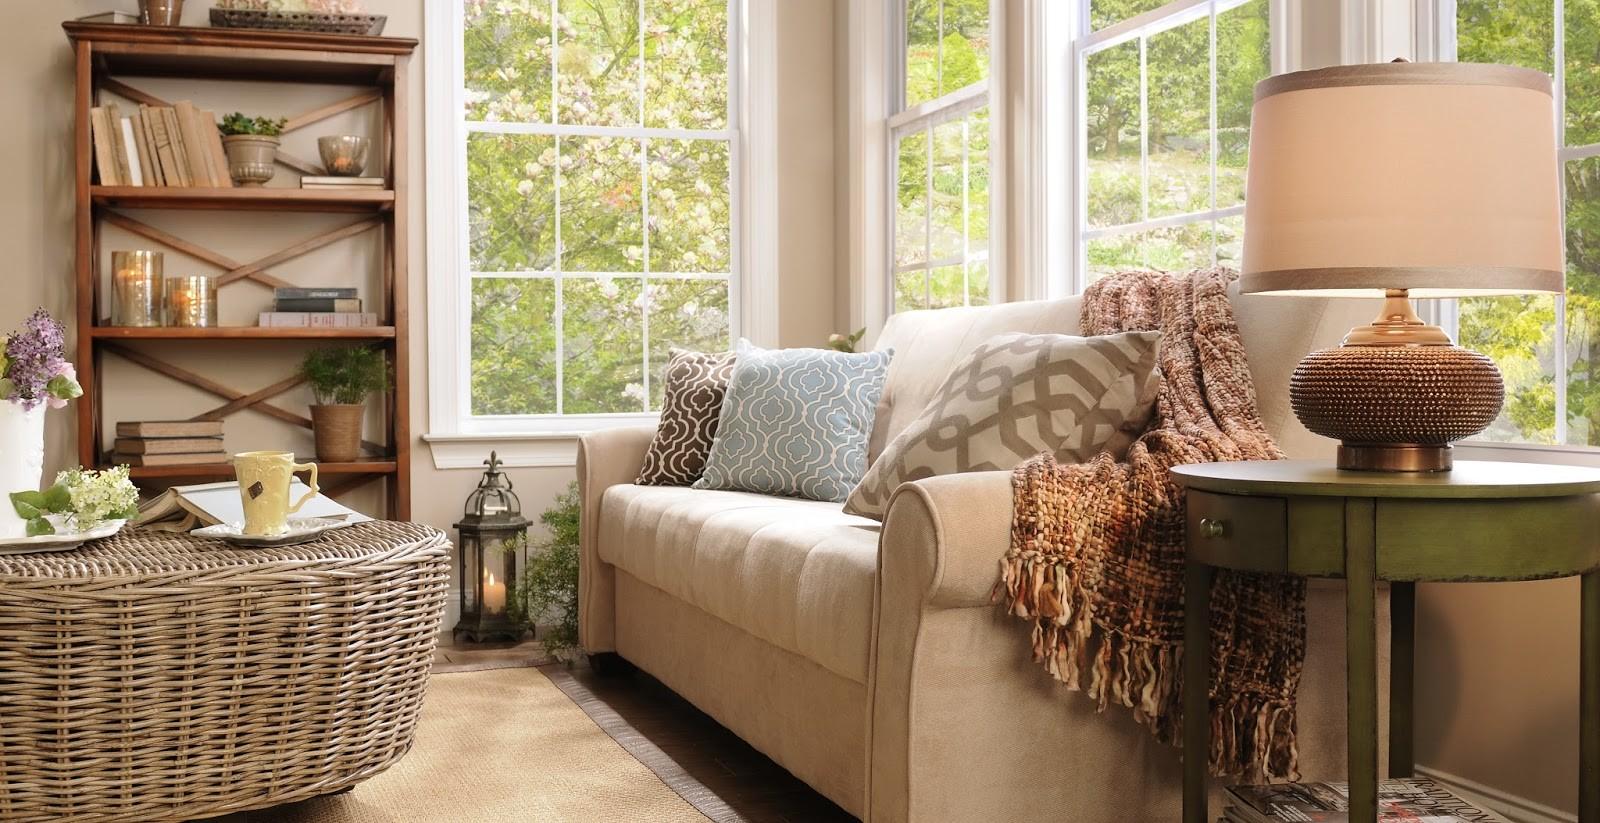 2 Furniture ideas Kirkland home decor by Simphome 4